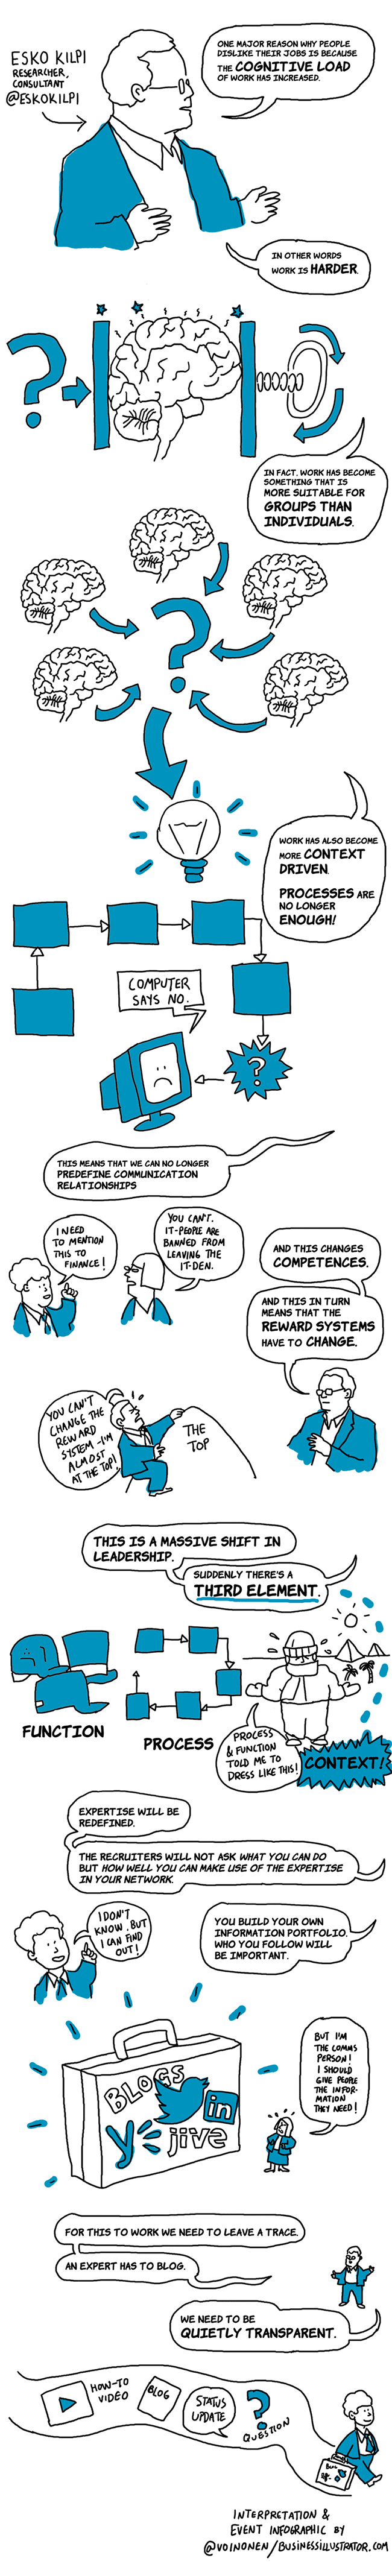 Esko Kilpi new work presentation in cartoons